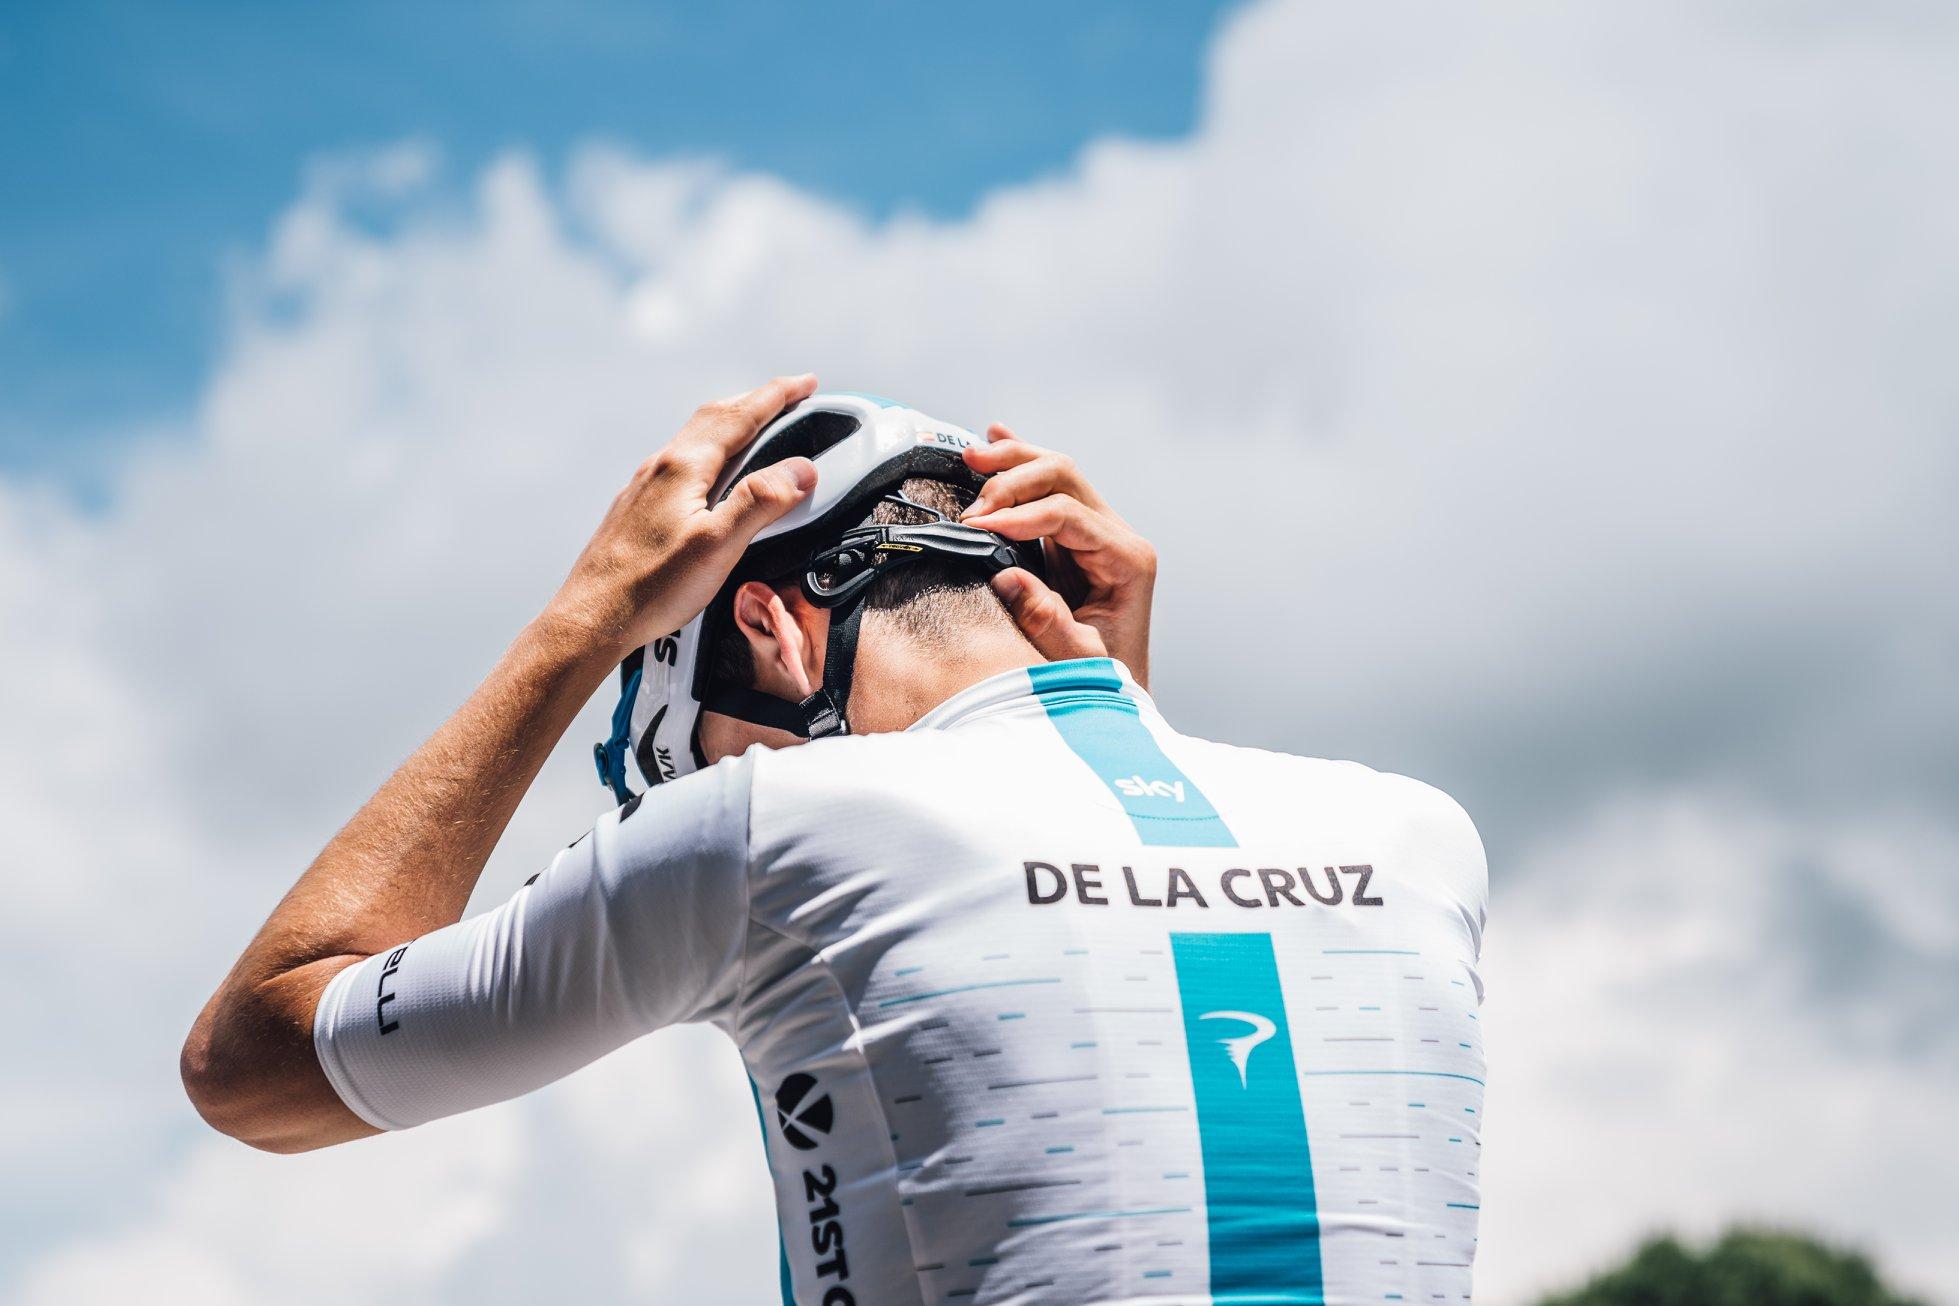 David de la Cruz - Vuelta España JoanSeguidor